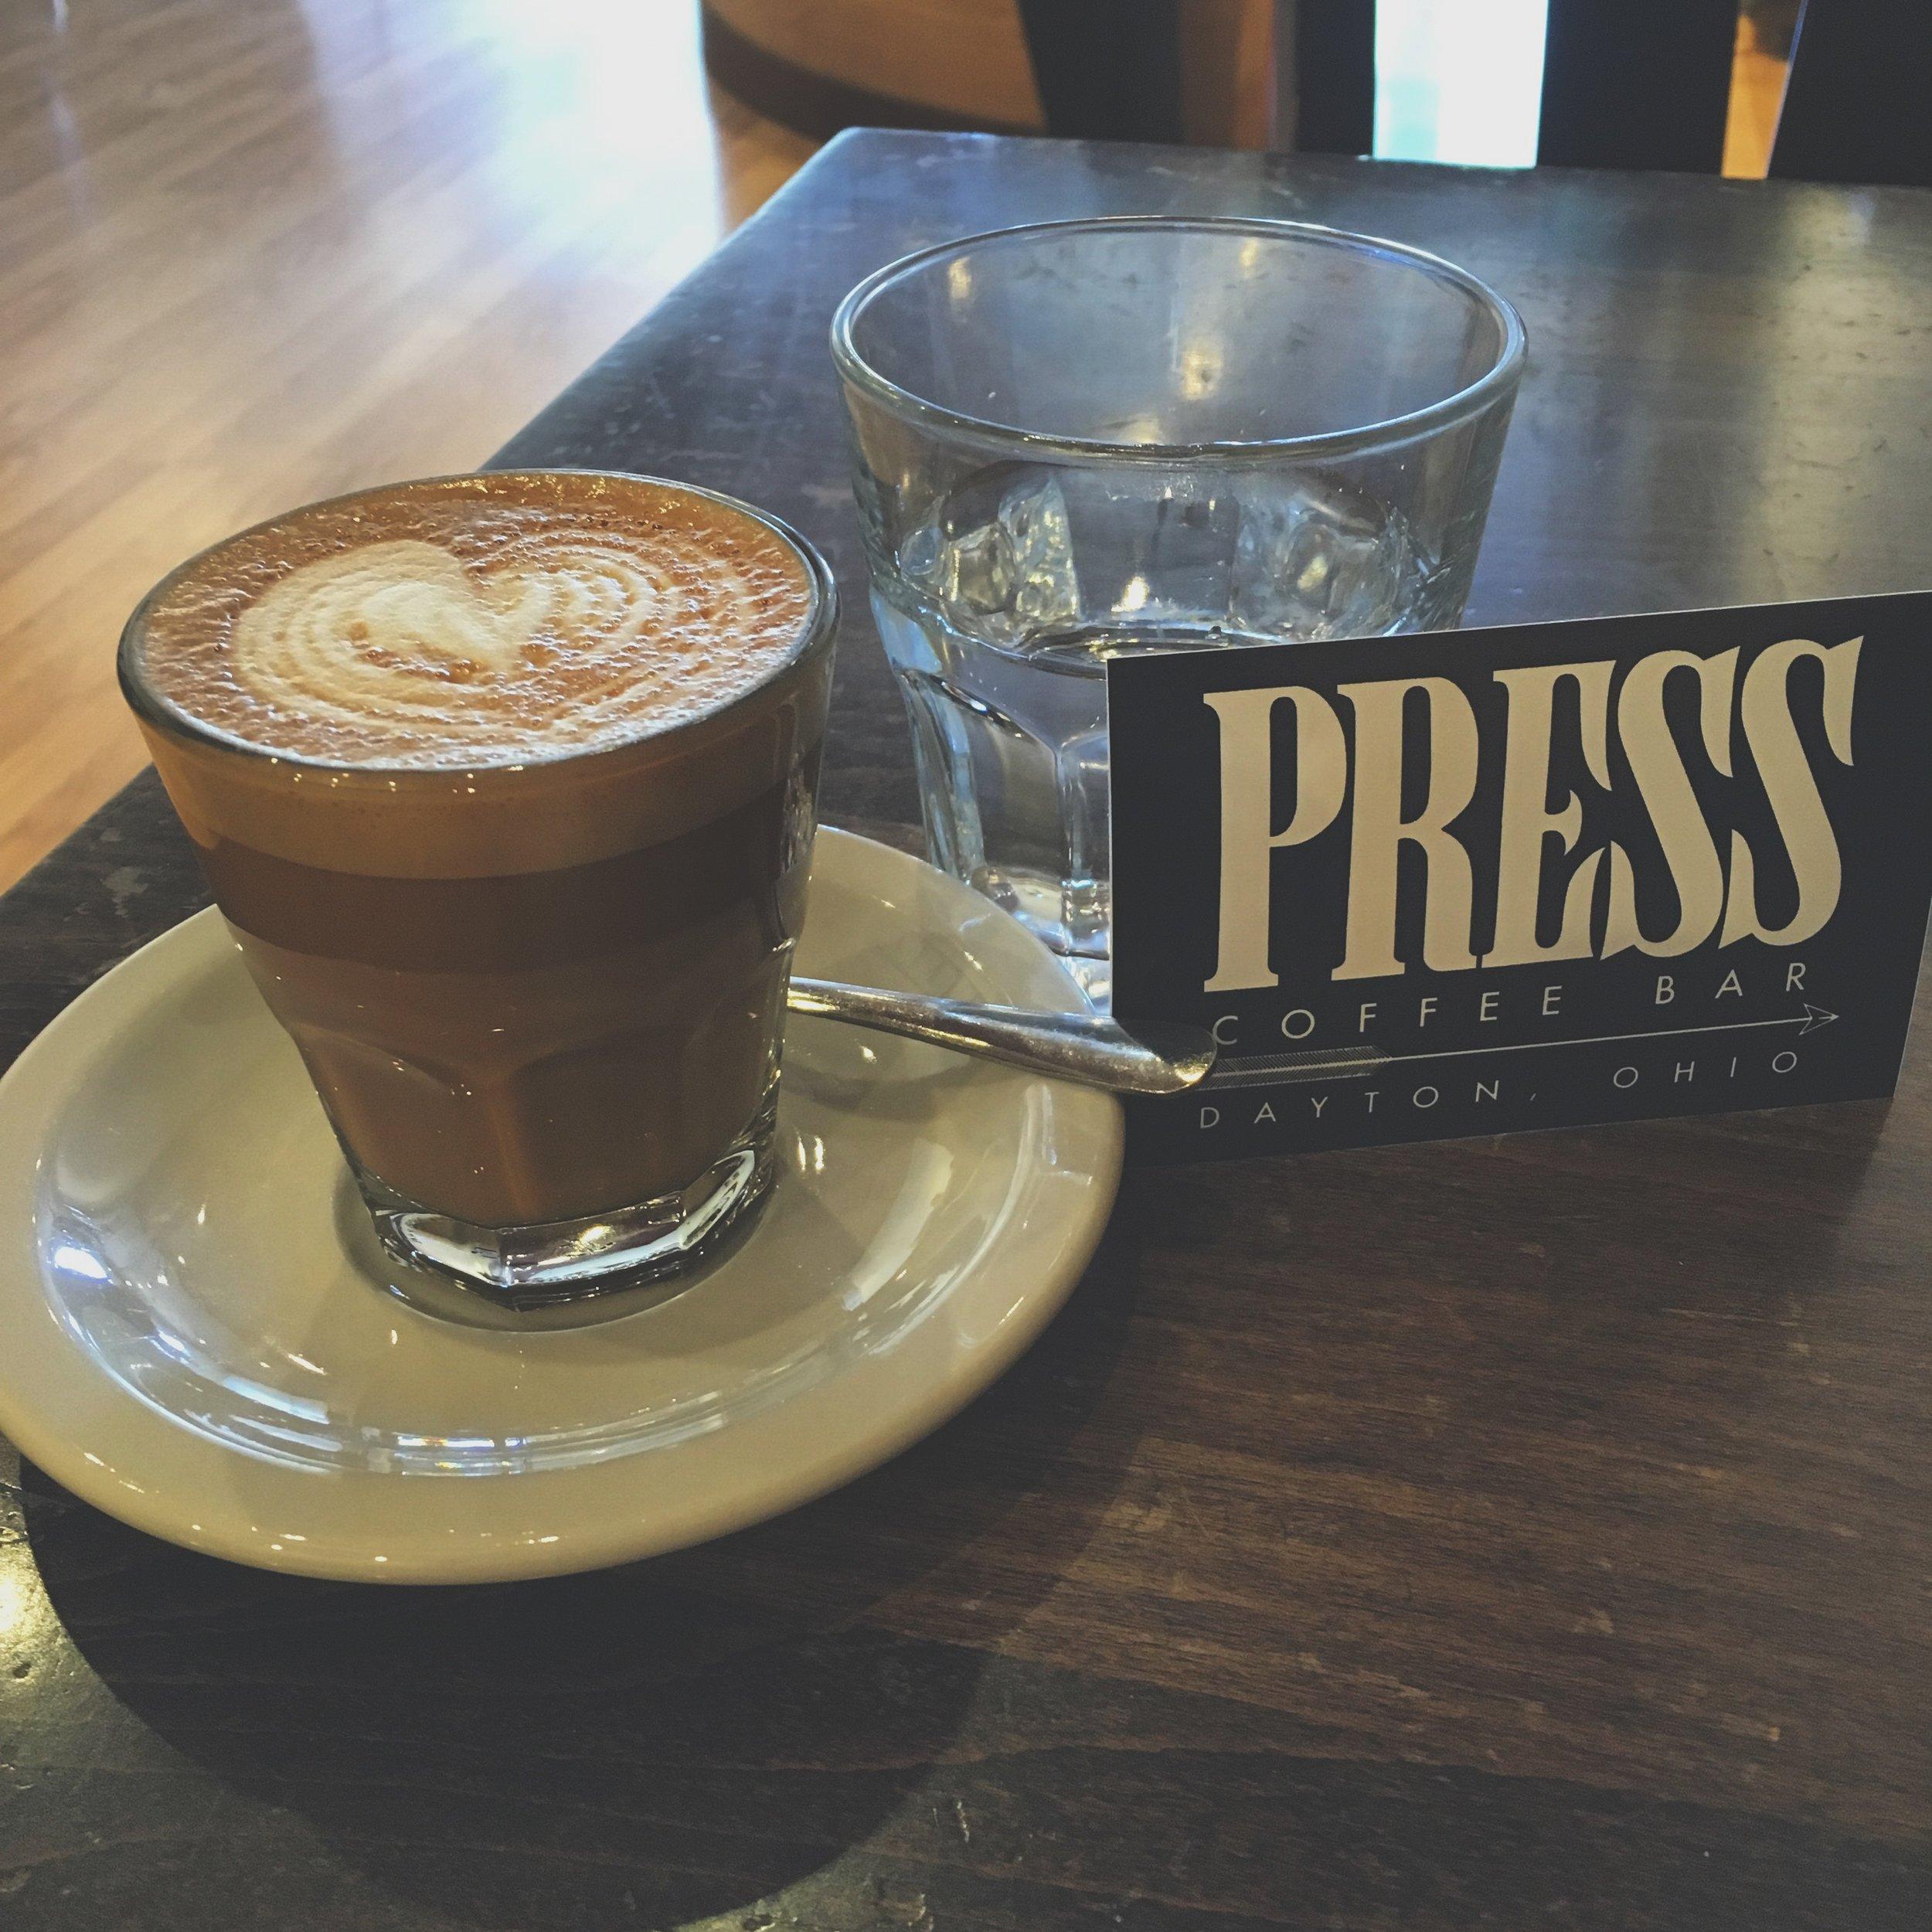 press coffee bar dayton ohio